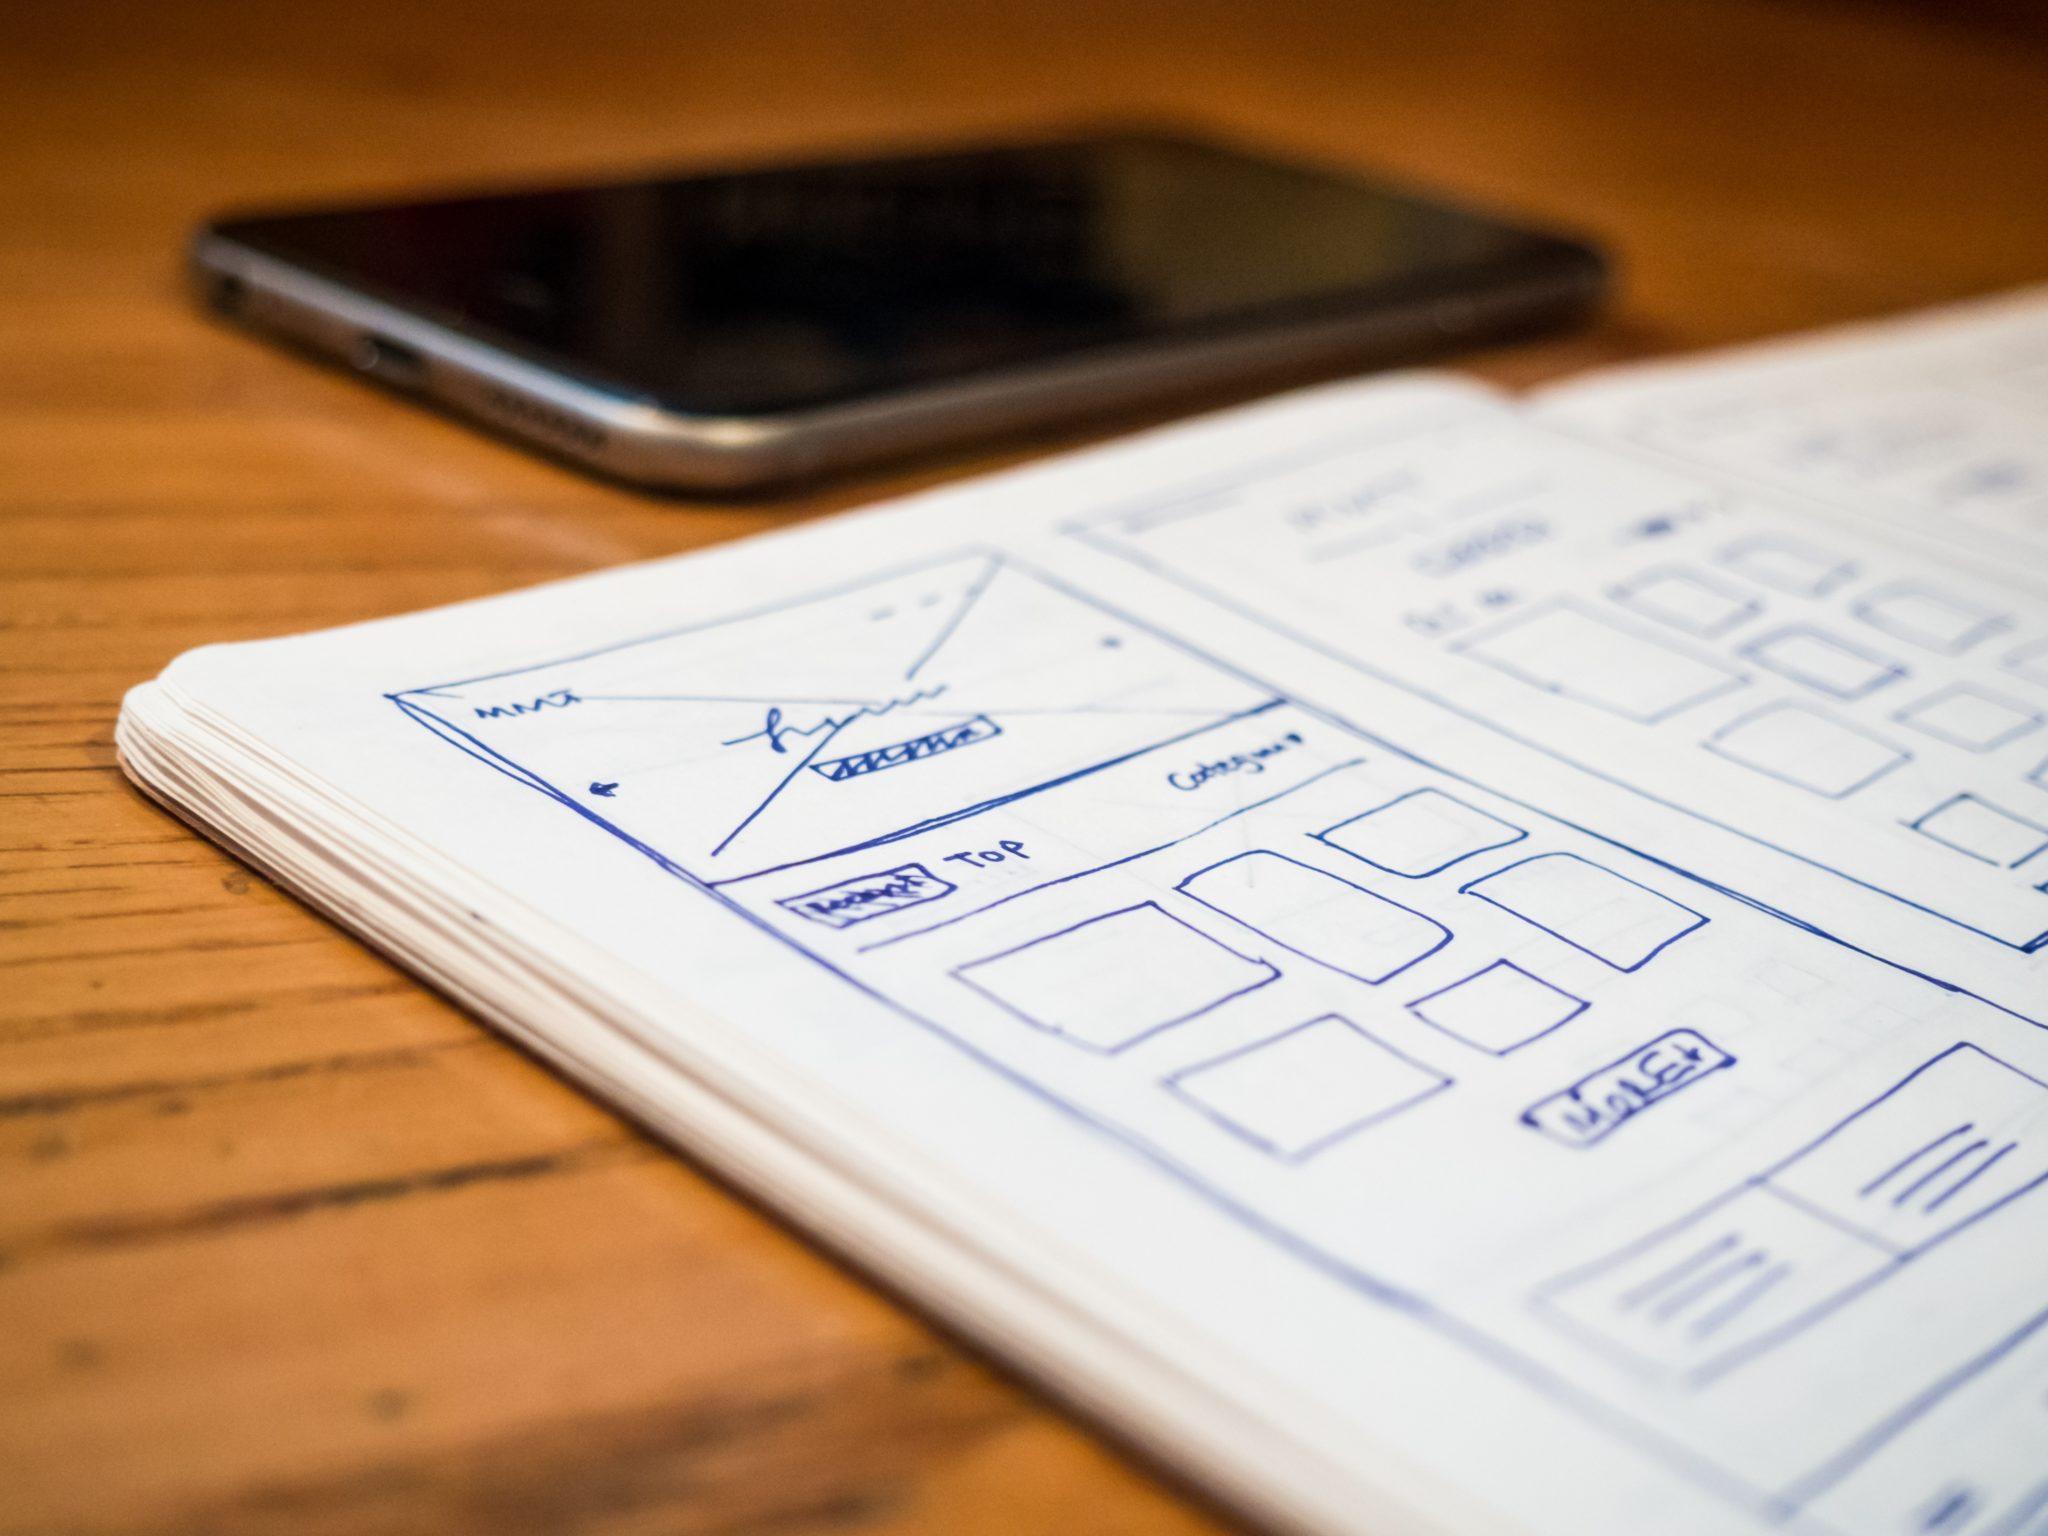 The product specialist job description blueprint for dealerships the product specialist job description blueprint for dealerships hireology malvernweather Gallery